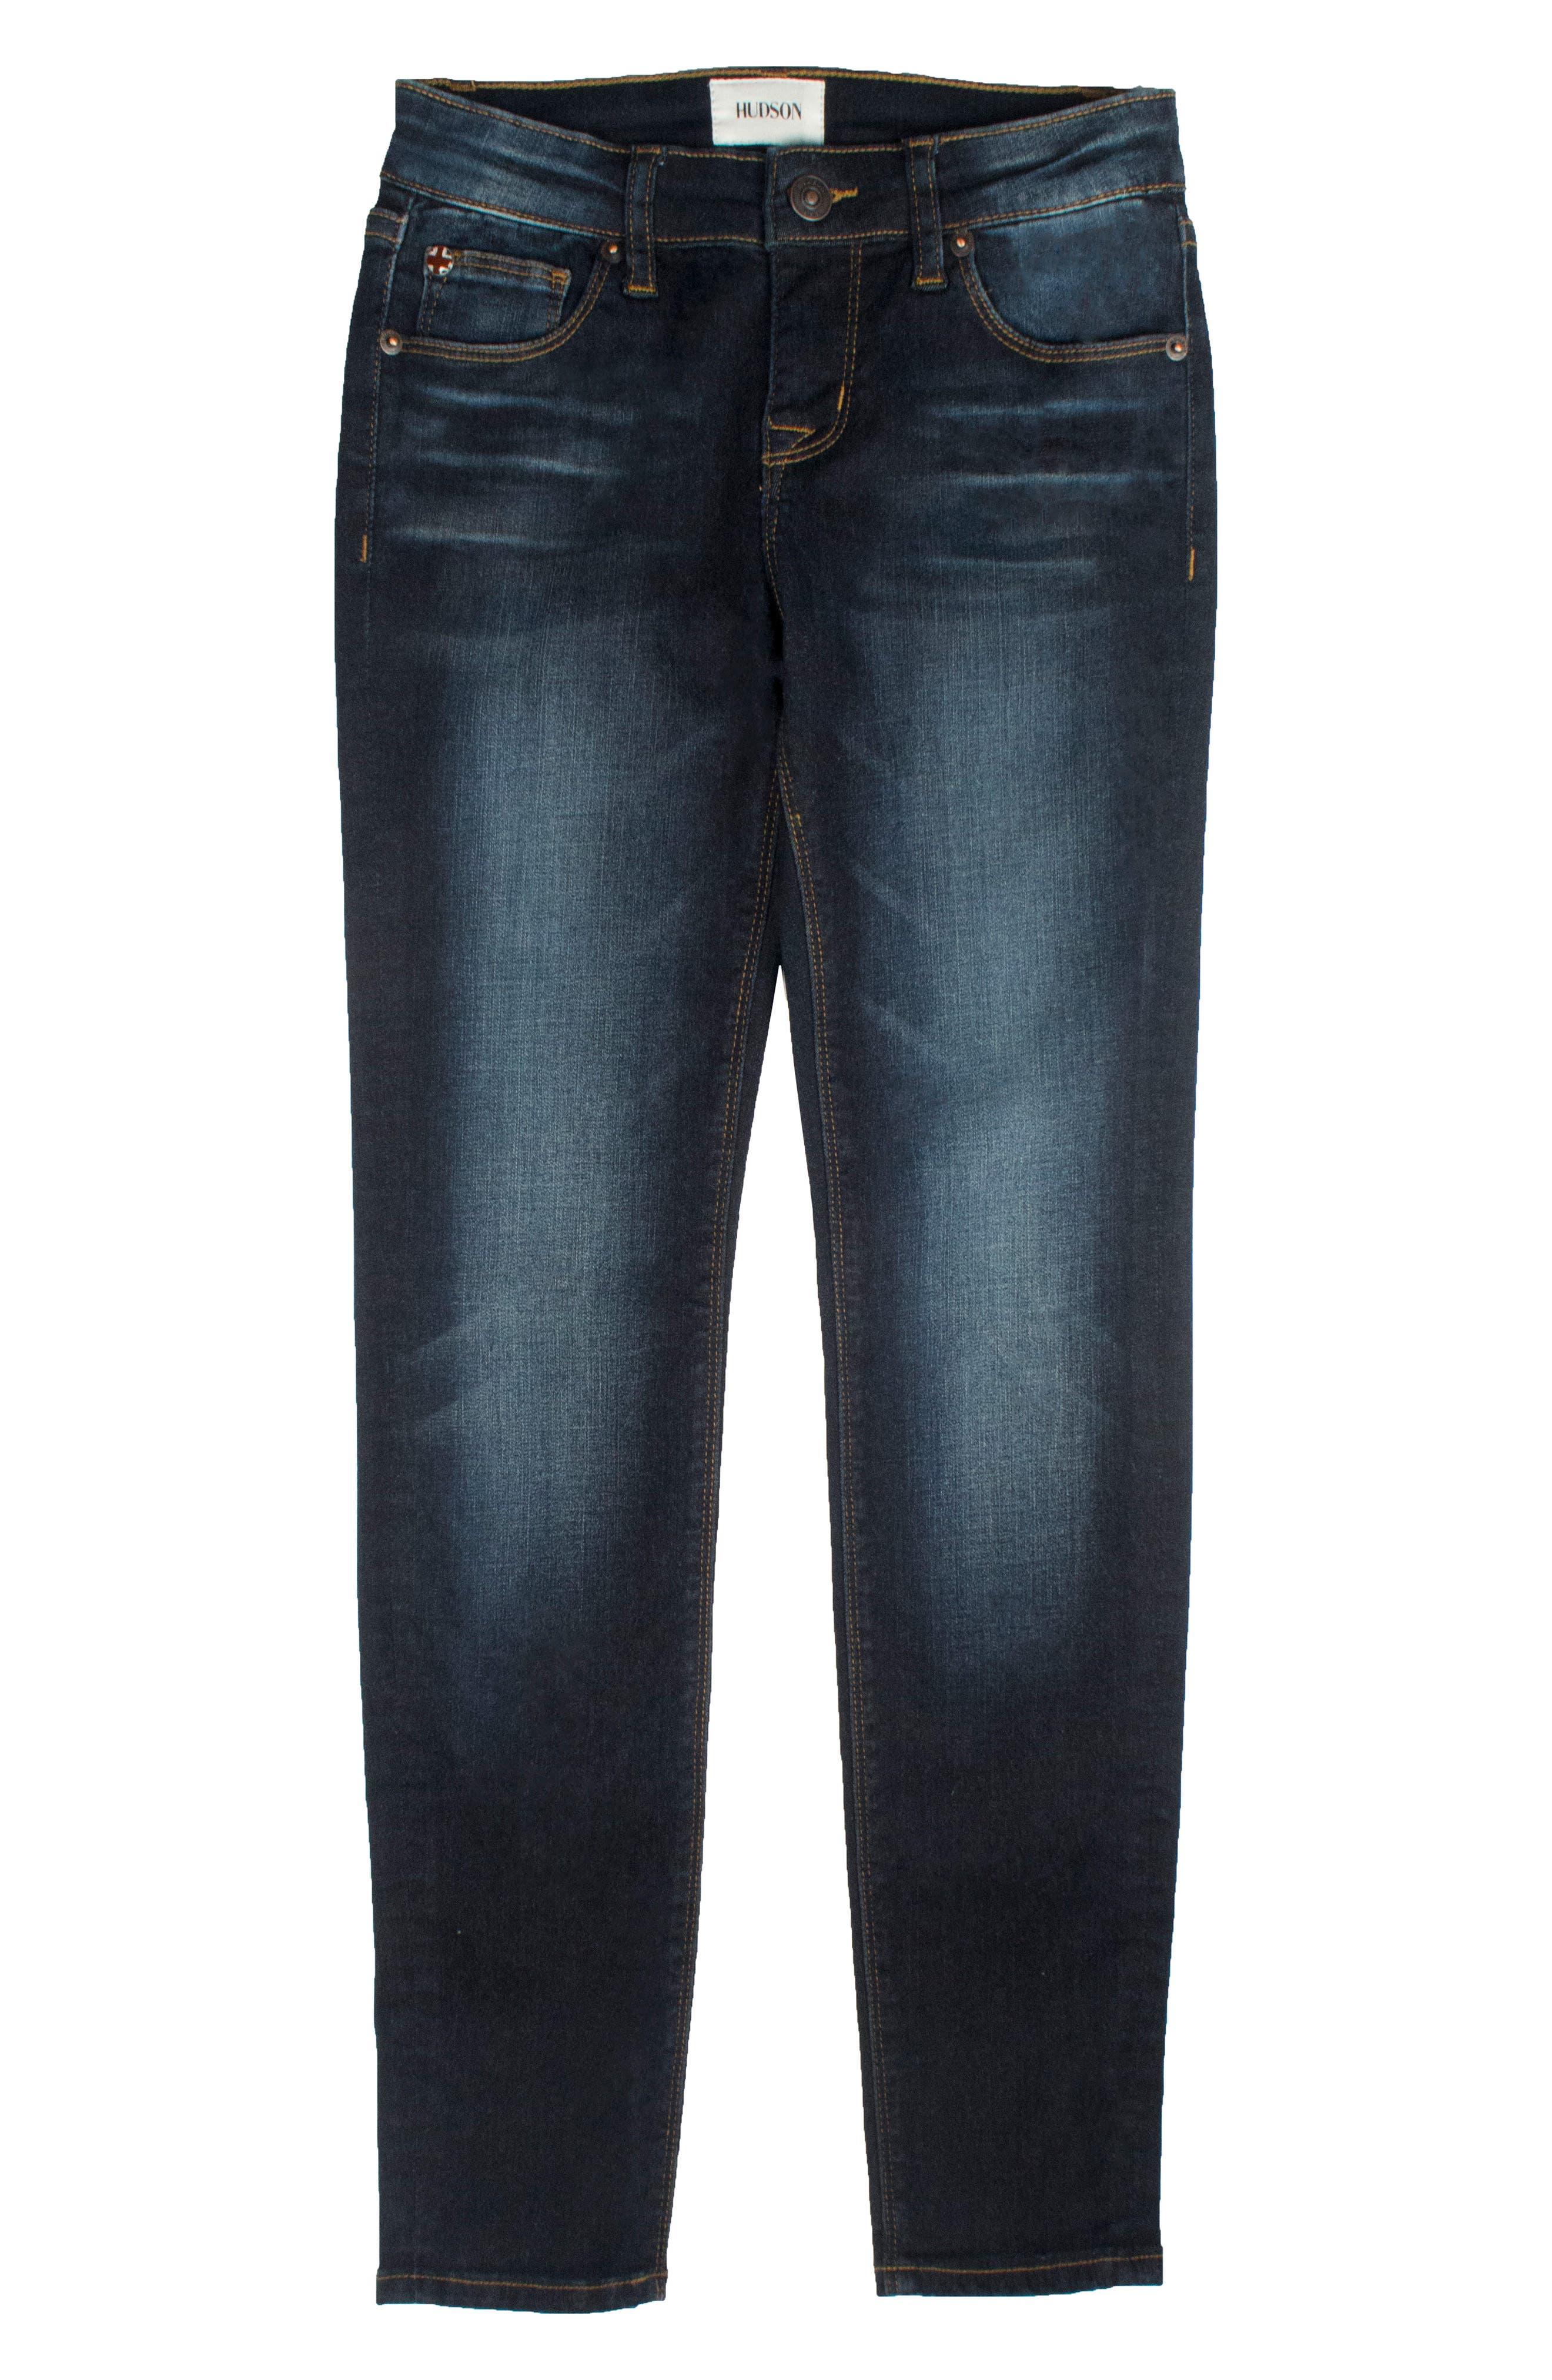 Hudson Kids Christa Super Stretch Skinny Jeans (Toddler Girls & Little Girls)